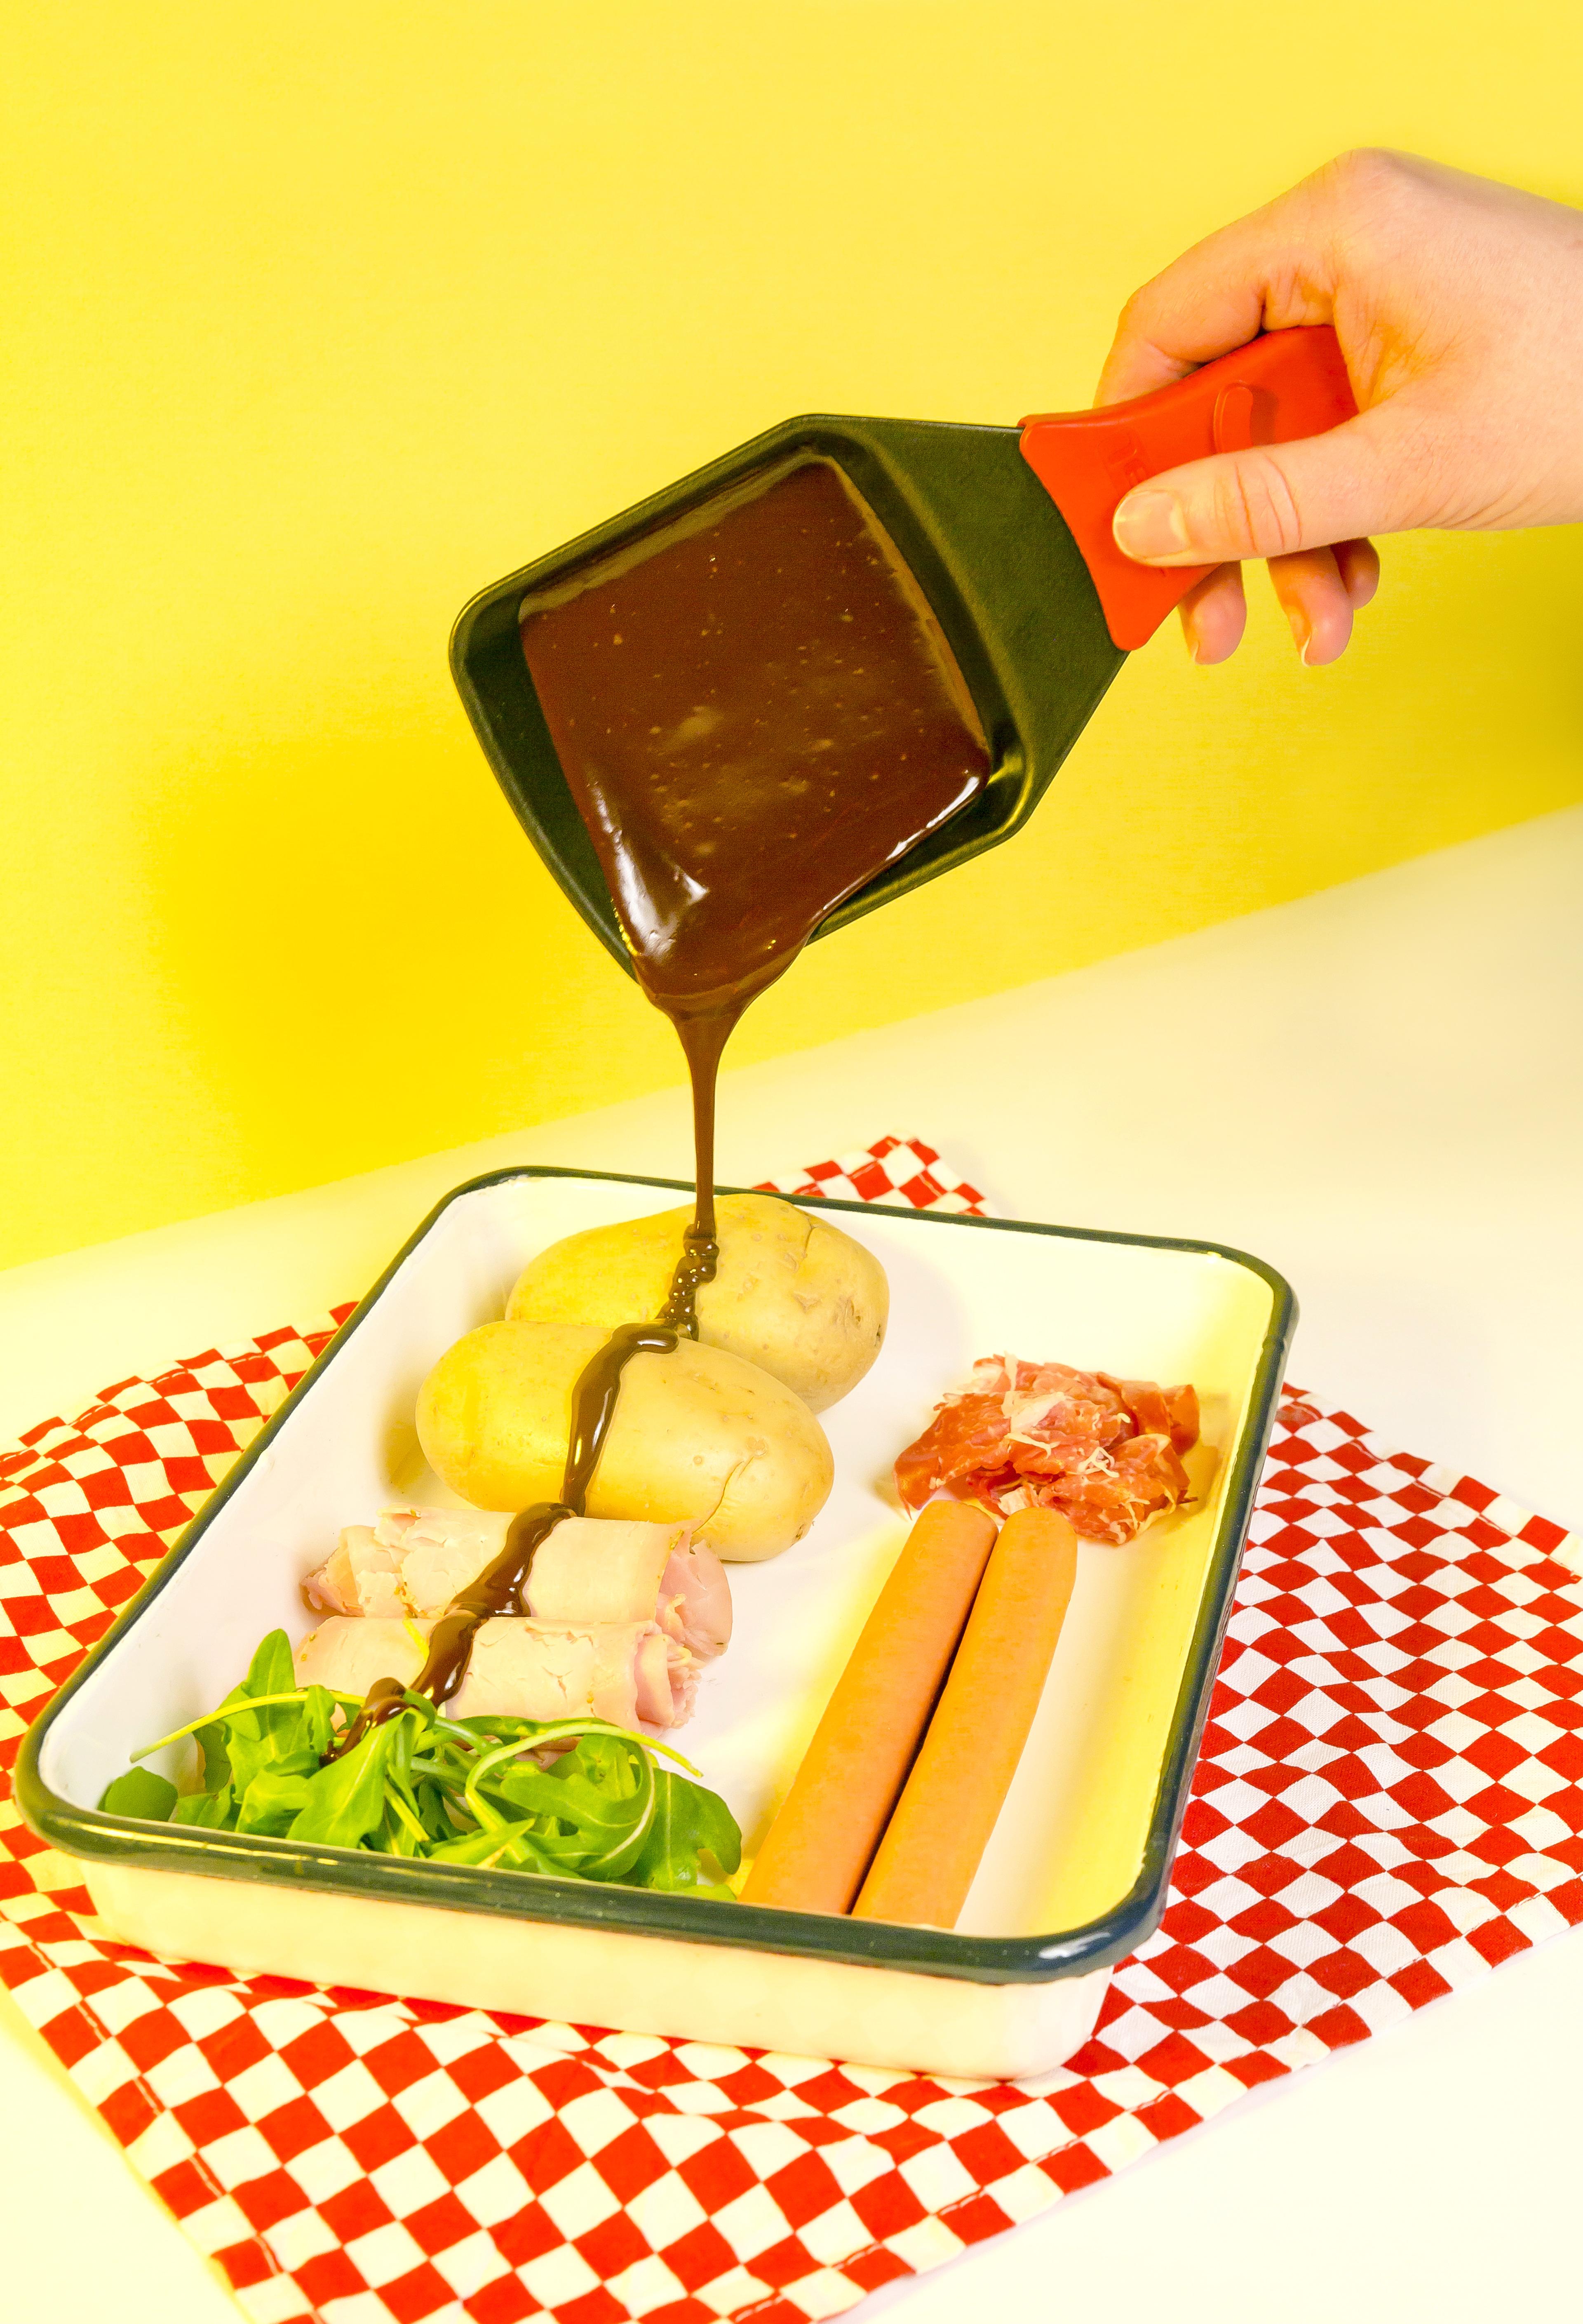 raclette chocolat fondu photoshooting